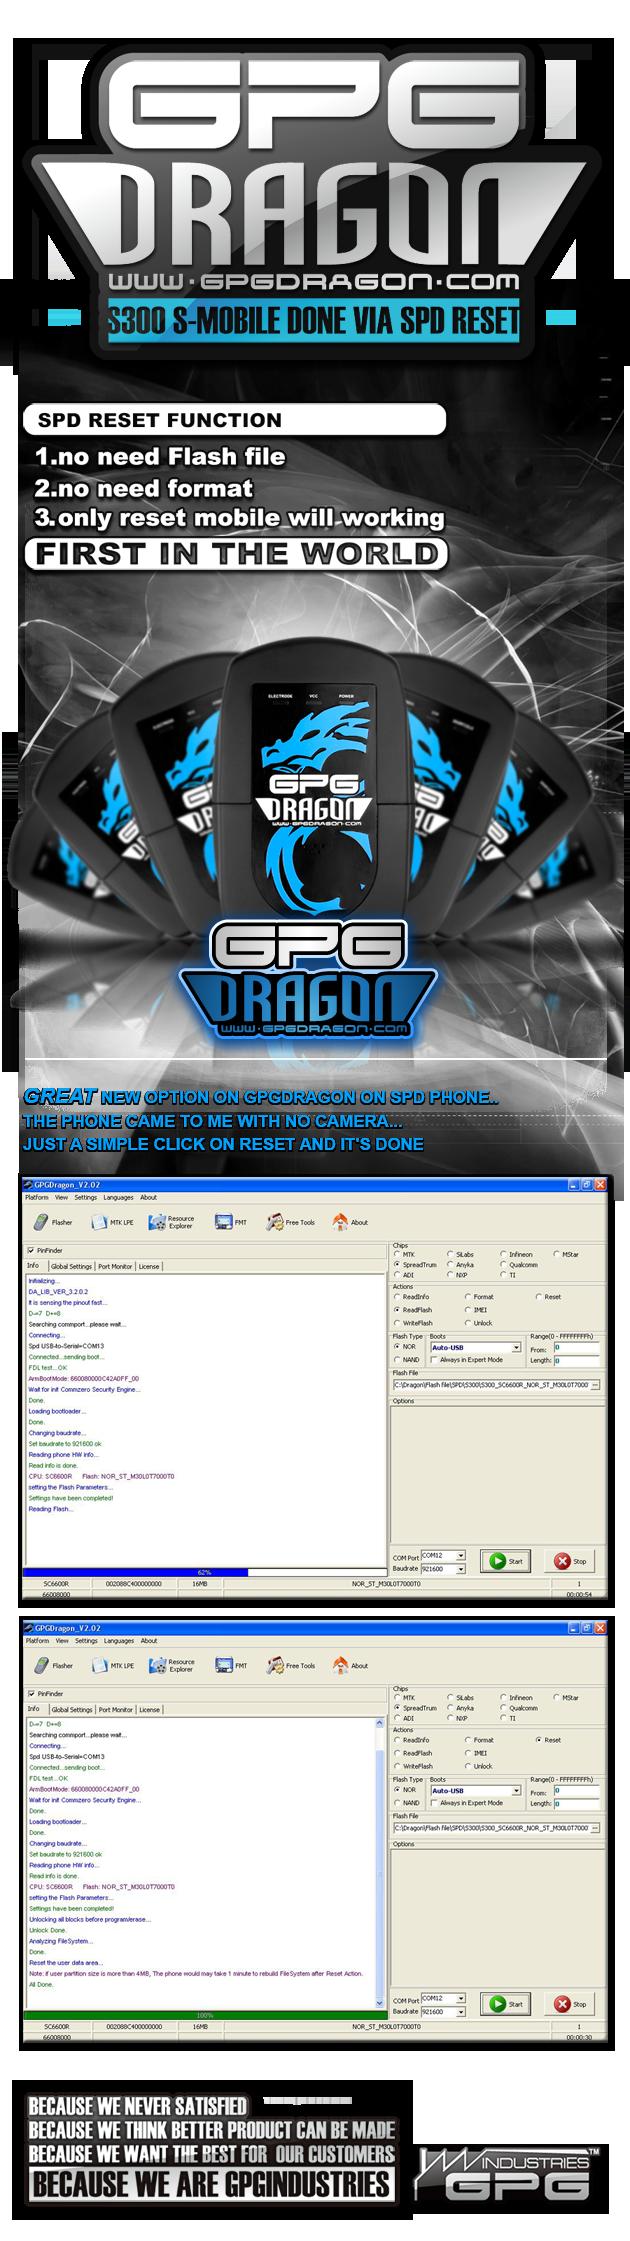 2011 03 02 GPGDRAGON S300 S Mobile DONE via SPD RESET 630